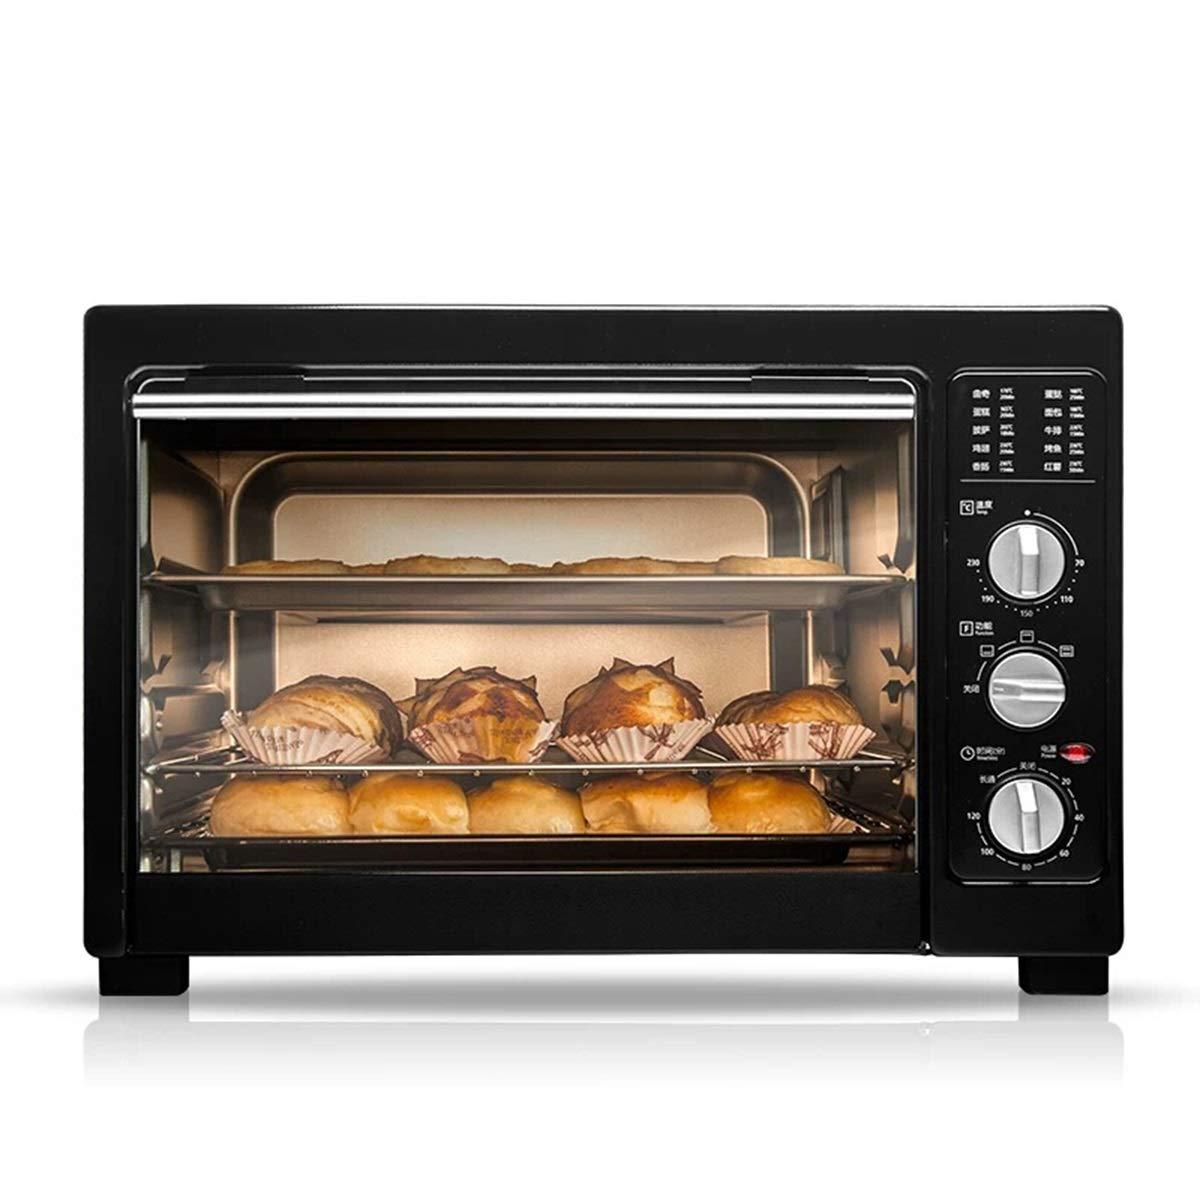 MWNV ミニオーブン - 電気オーブン家庭用多機能ミニベーキング38 L李容量インテリジェント温度制御オーブン -86 オーブン   B07NWYNWW2